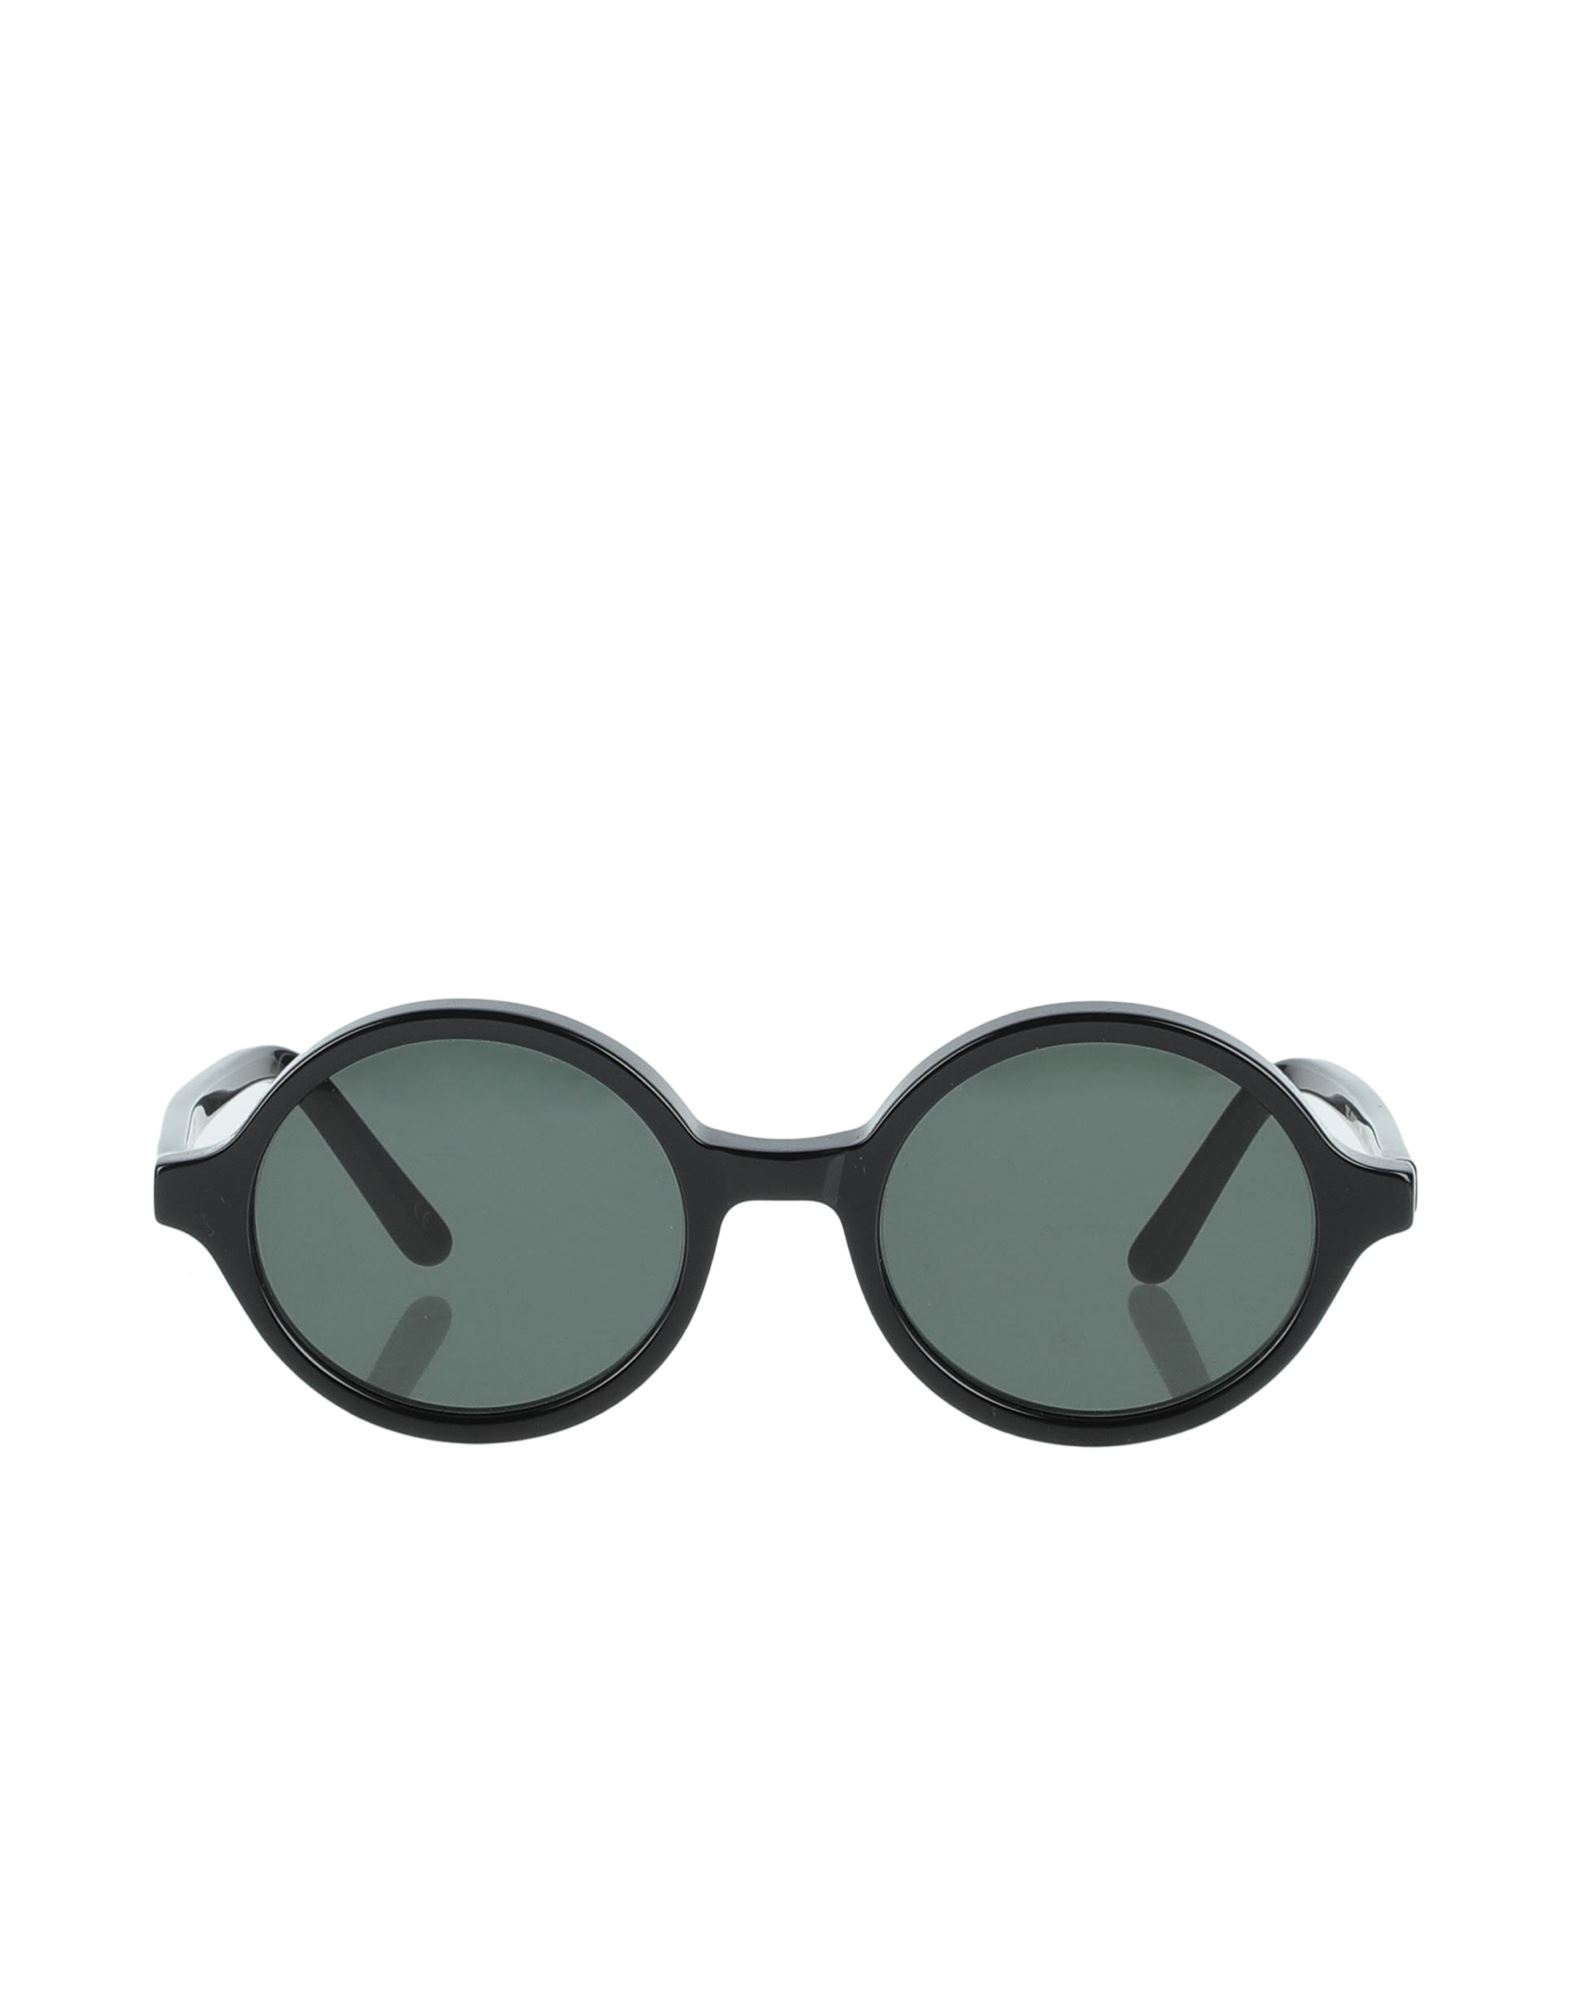 HAN KJØBENHAVN Sunglasses - Item 46745066